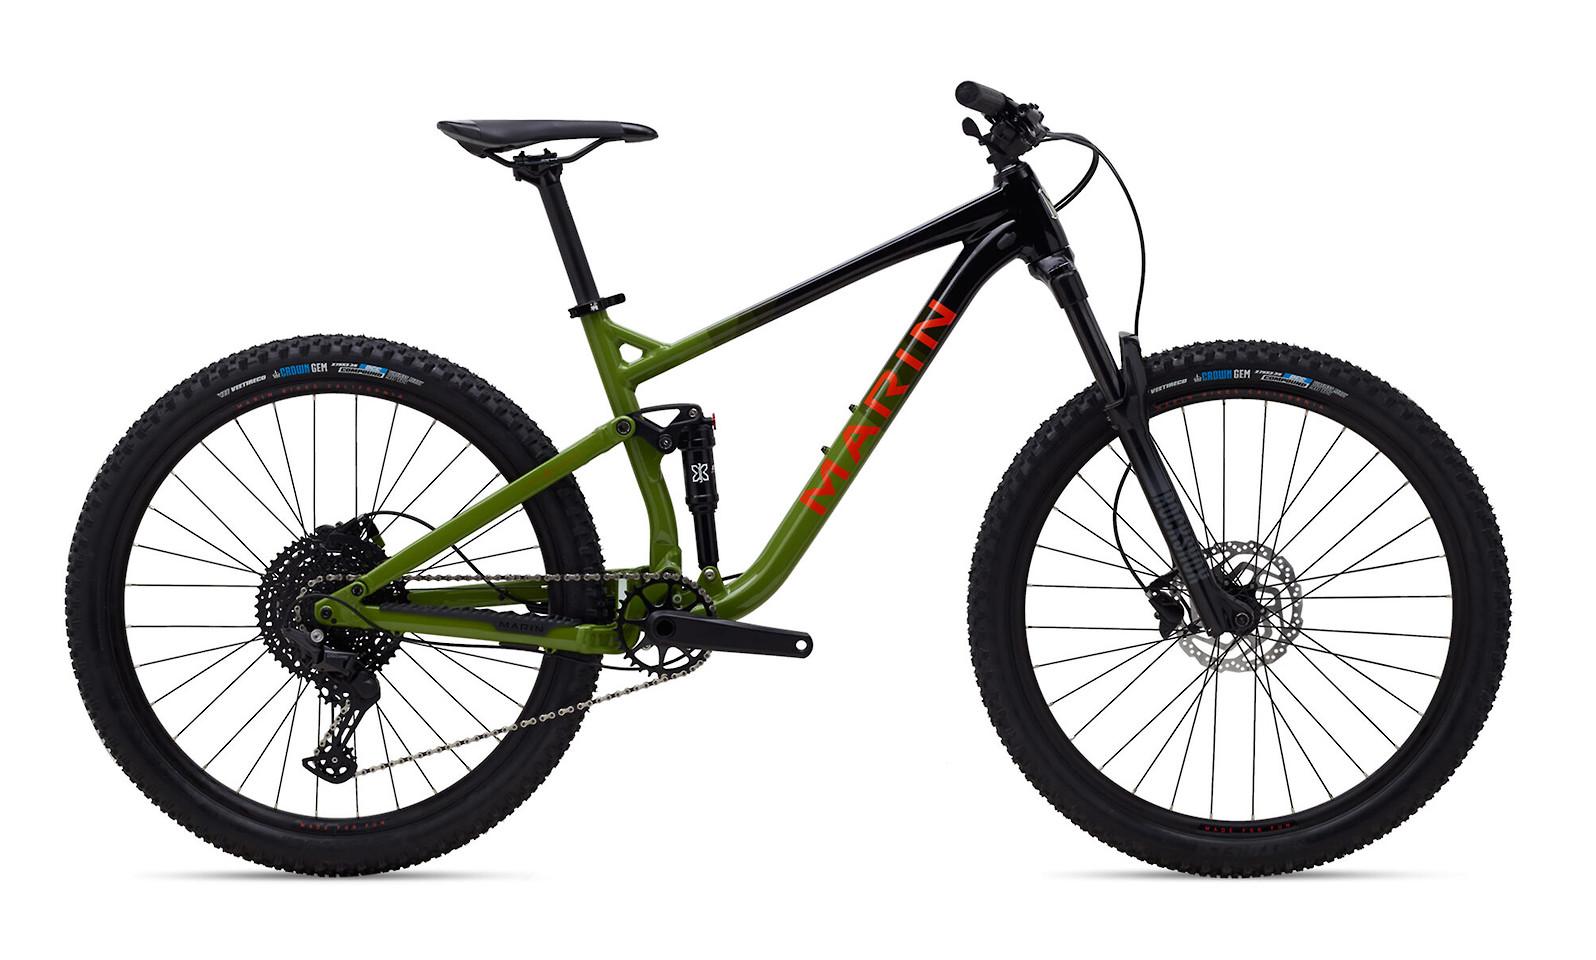 2021 Marin Hawk Hill 1 (Gloss Black/Green/Orange)